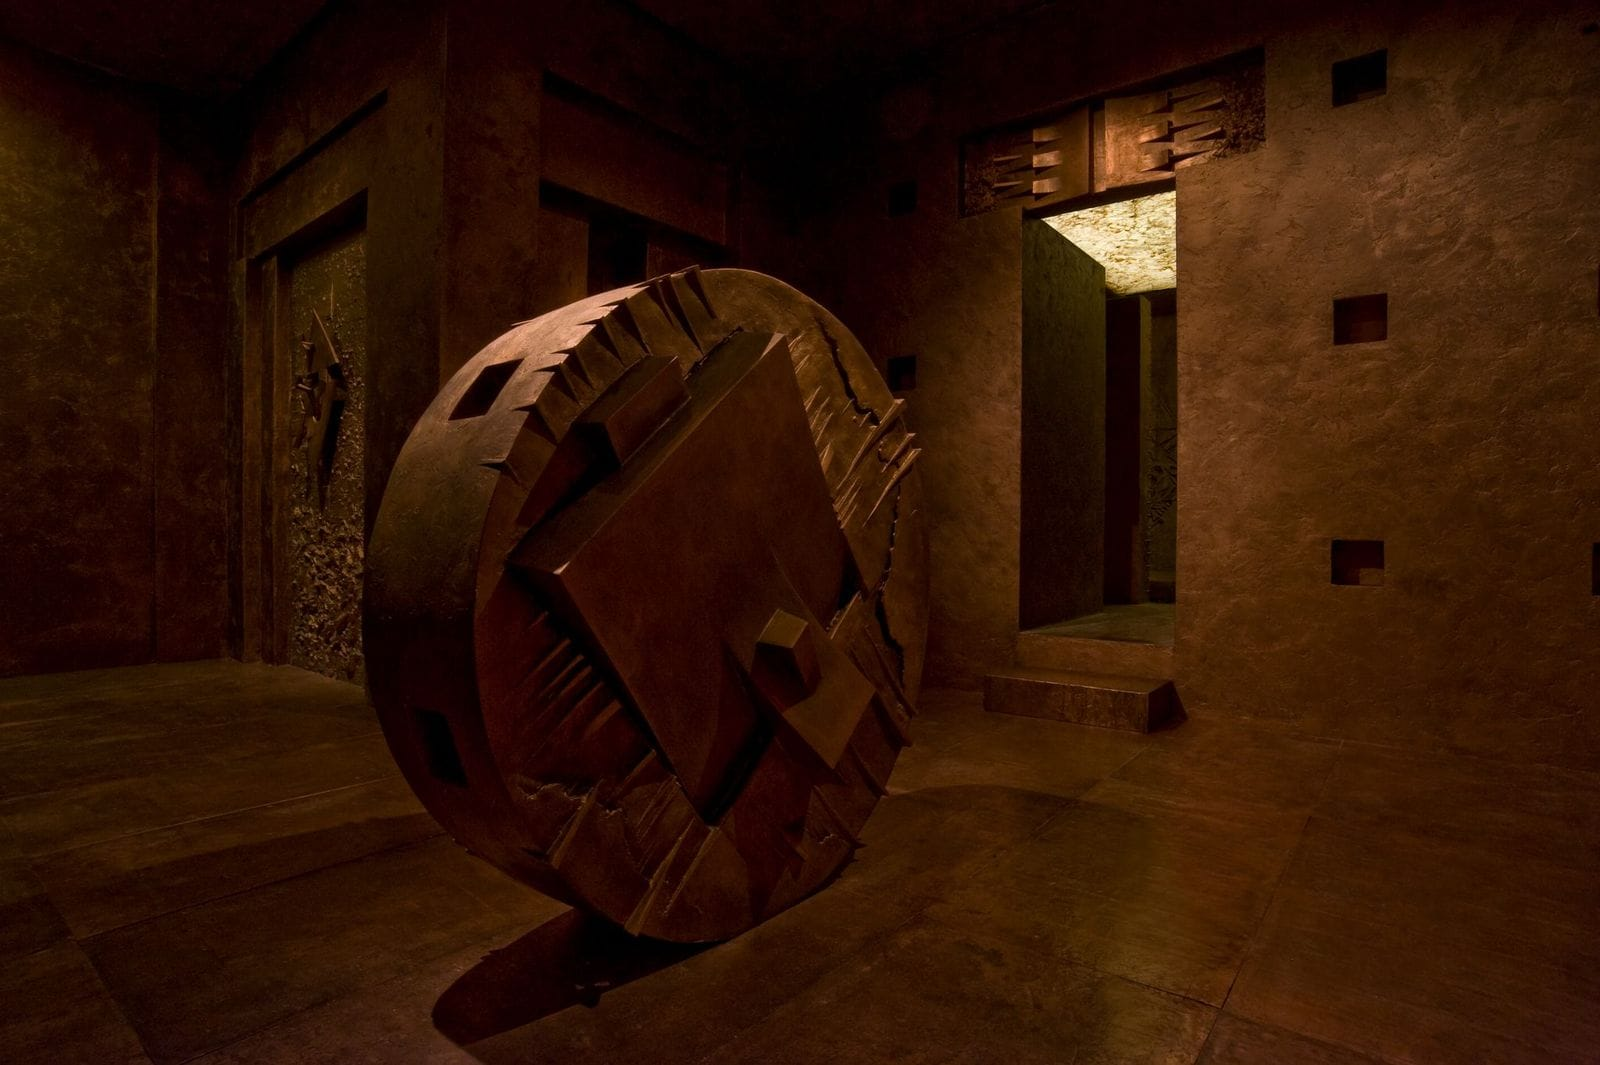 Labirinto, Dario Tettamanzi (c)